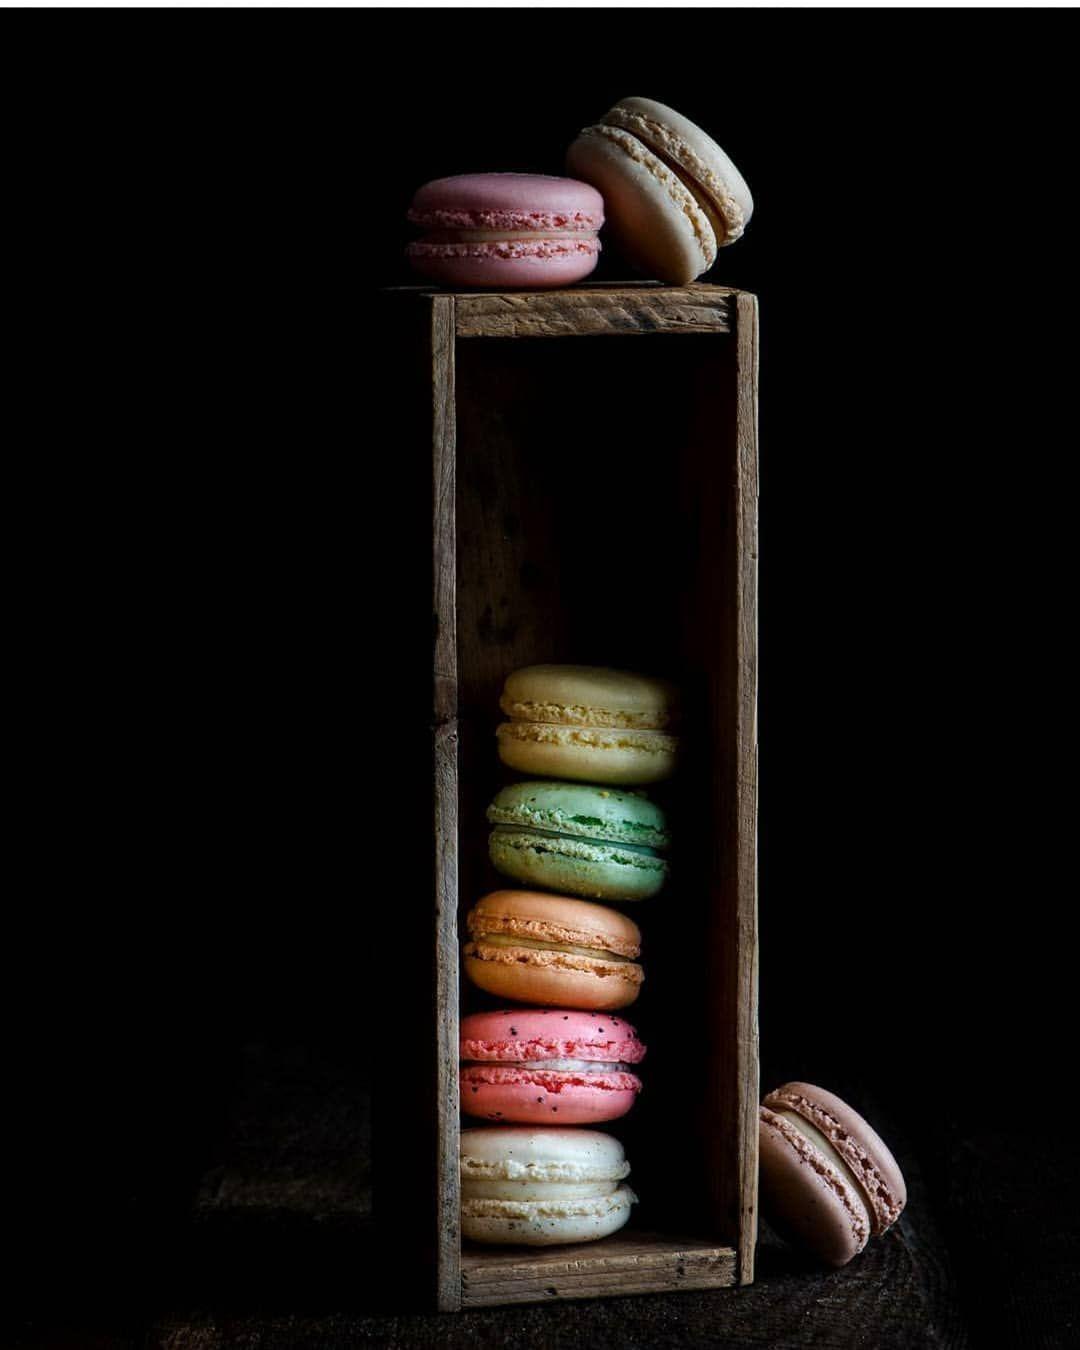 Macarons Credi Dark Food Photography Macarons Food Wallpaper